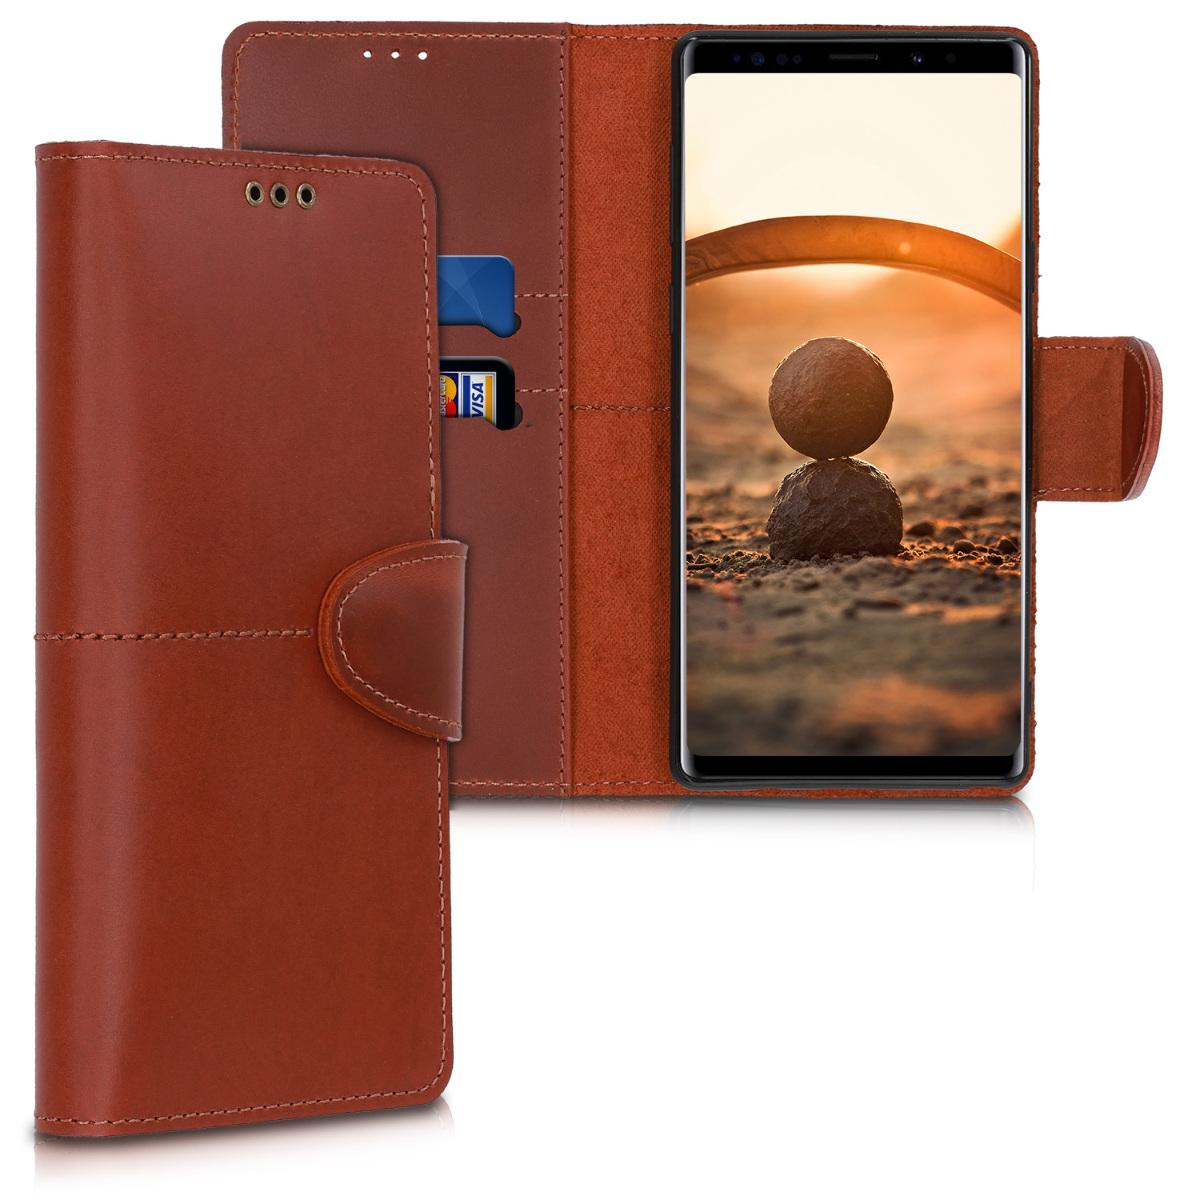 Kožené pouzdro pro Samsung Note 9 - tmavě hnědá